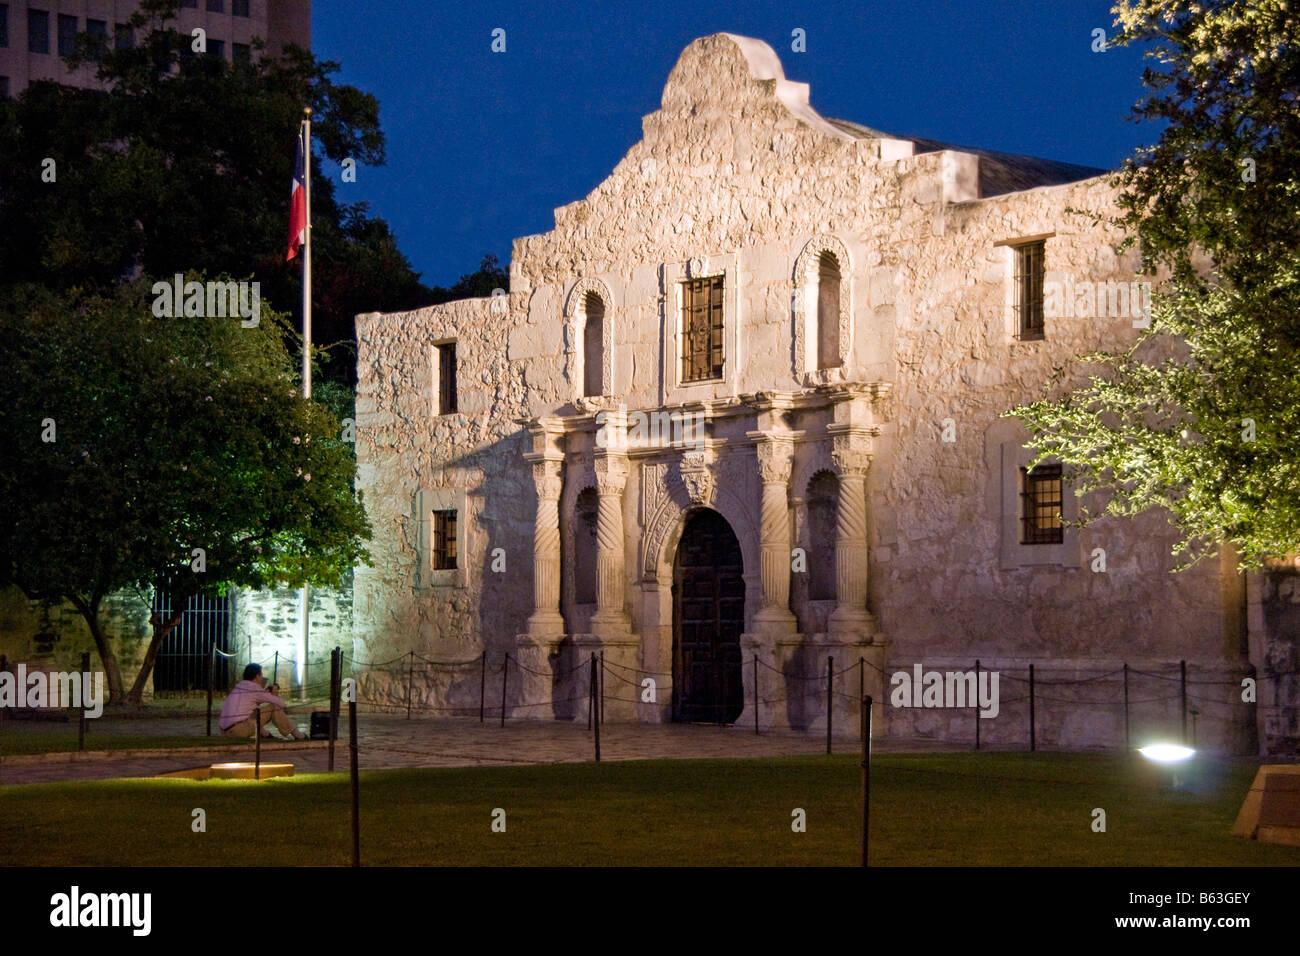 San Antonio Missions, The Alamo (AKA Mission San Antonio de Valero), State Historic Site at night - Stock Image